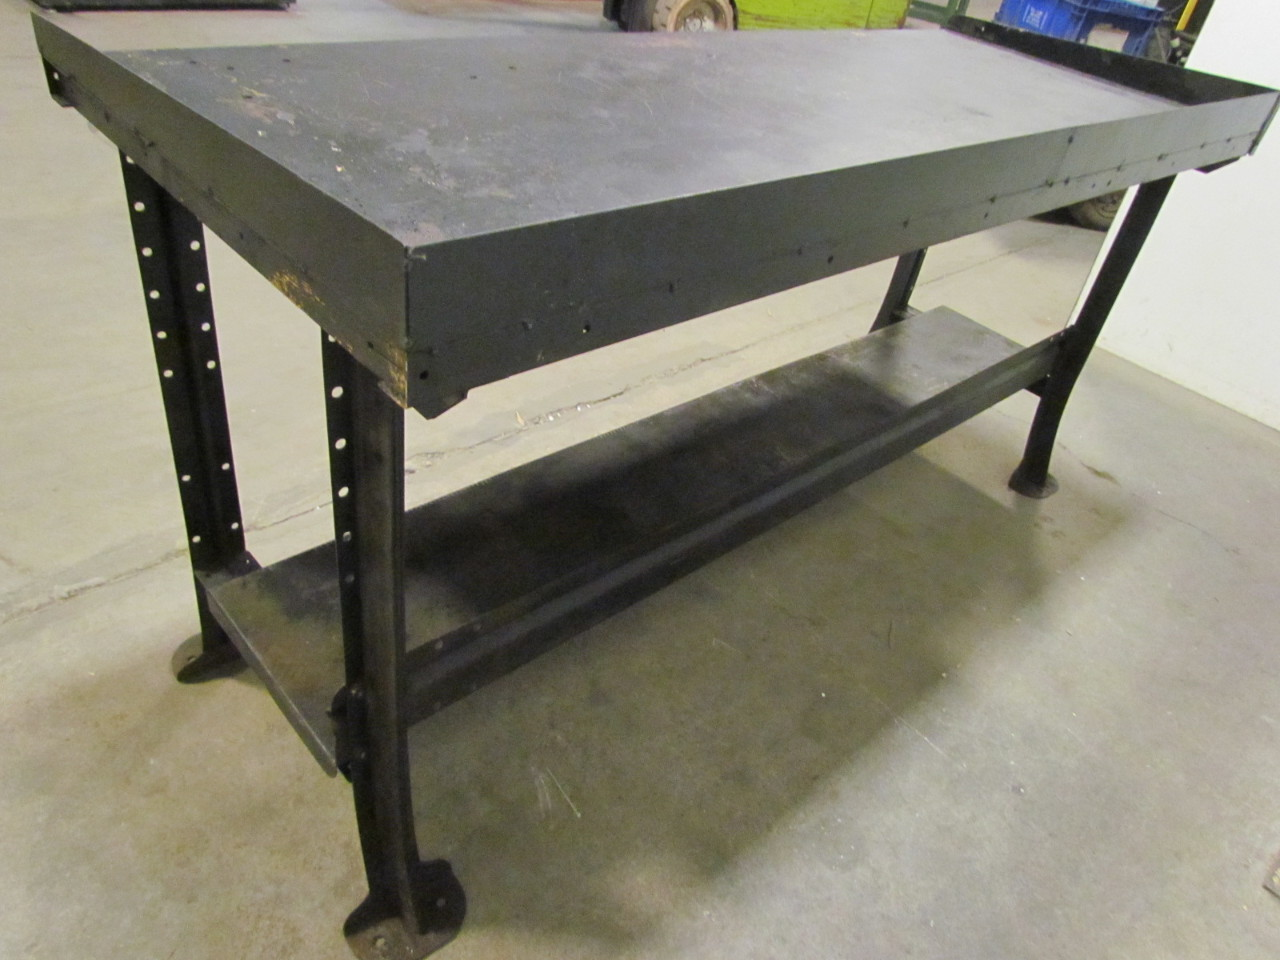 Vintage Industrial Steel 4 Leg Workbench Table 72 X28 X34 Height Black Ebay